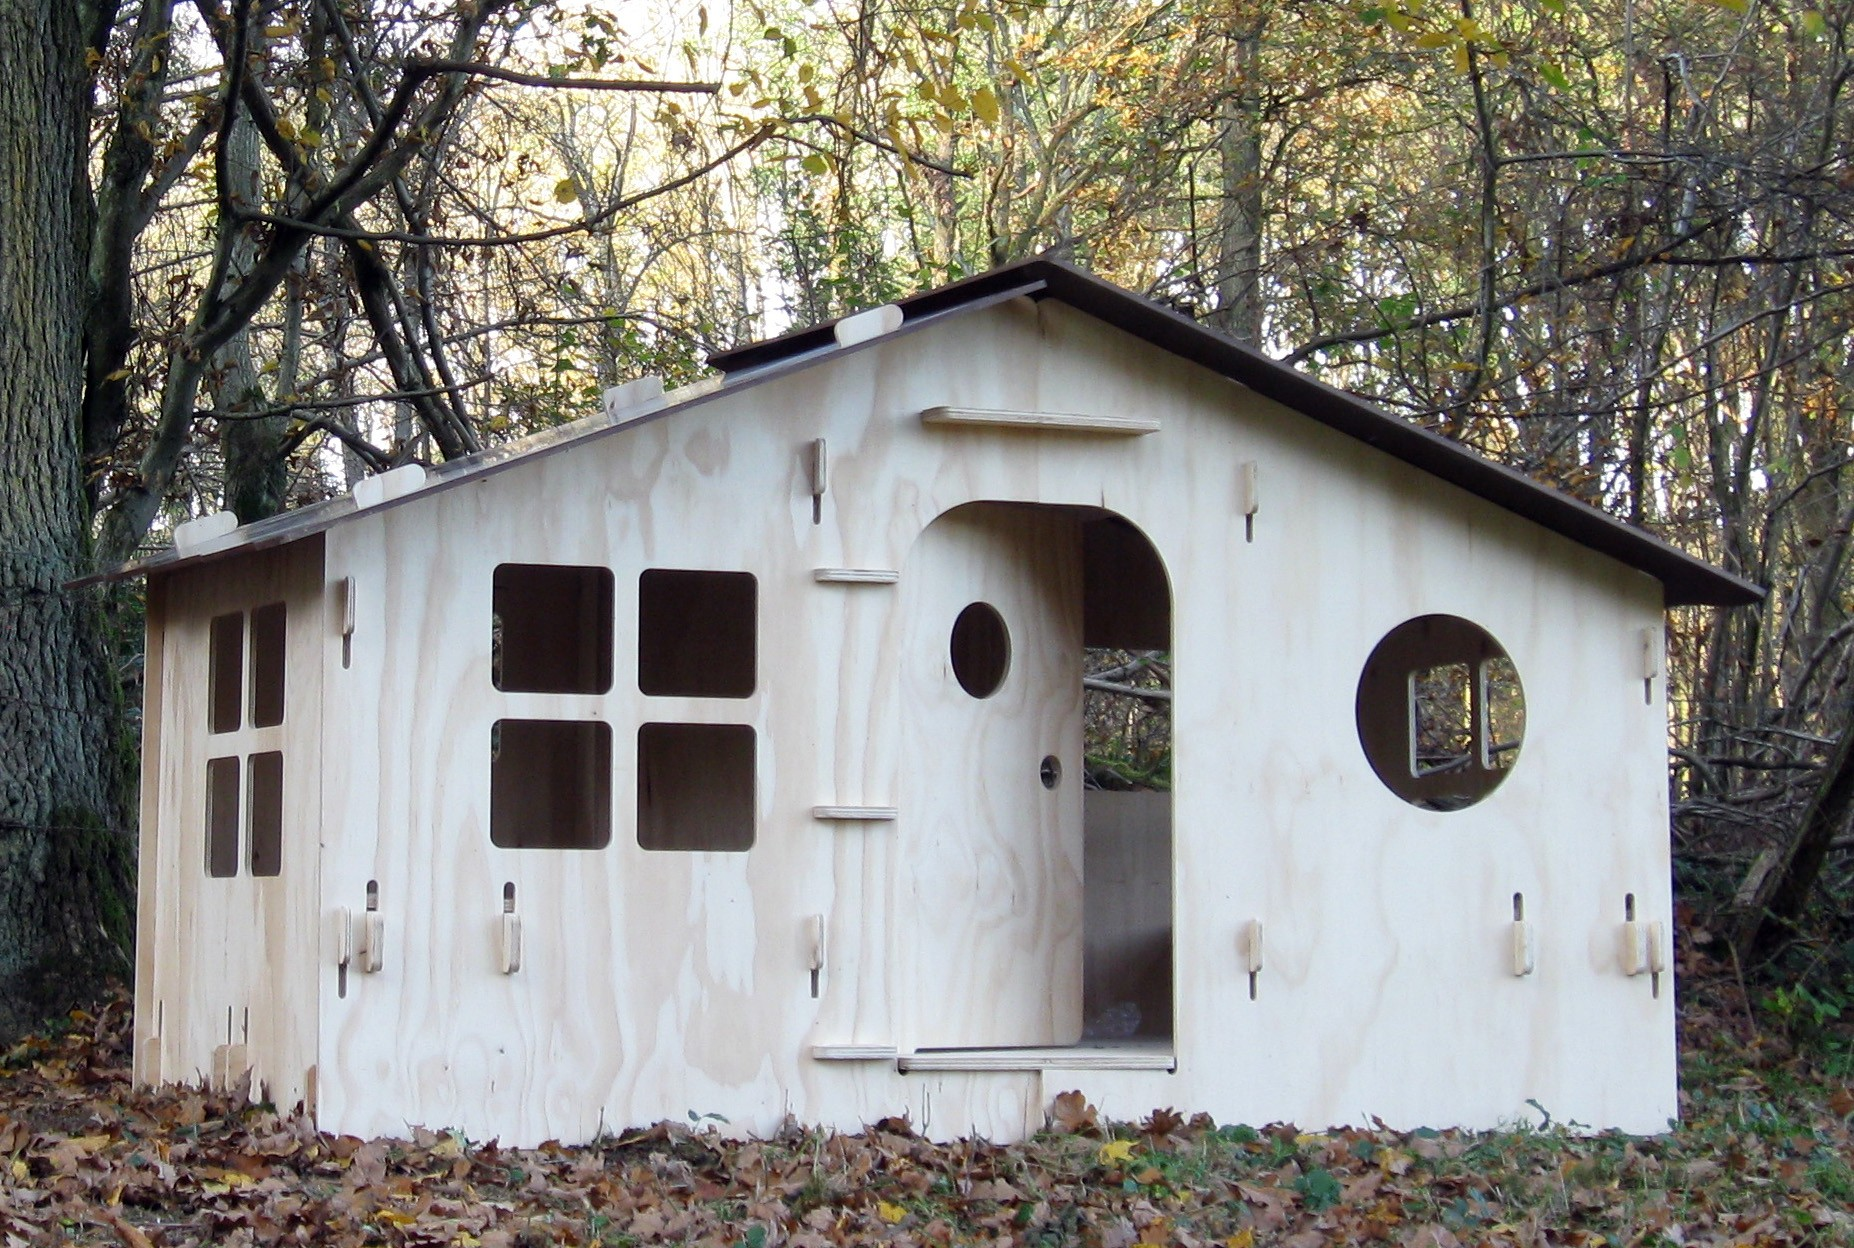 cabane chalet lola pour enfant mathy by bols lasure blanc pastel. Black Bedroom Furniture Sets. Home Design Ideas